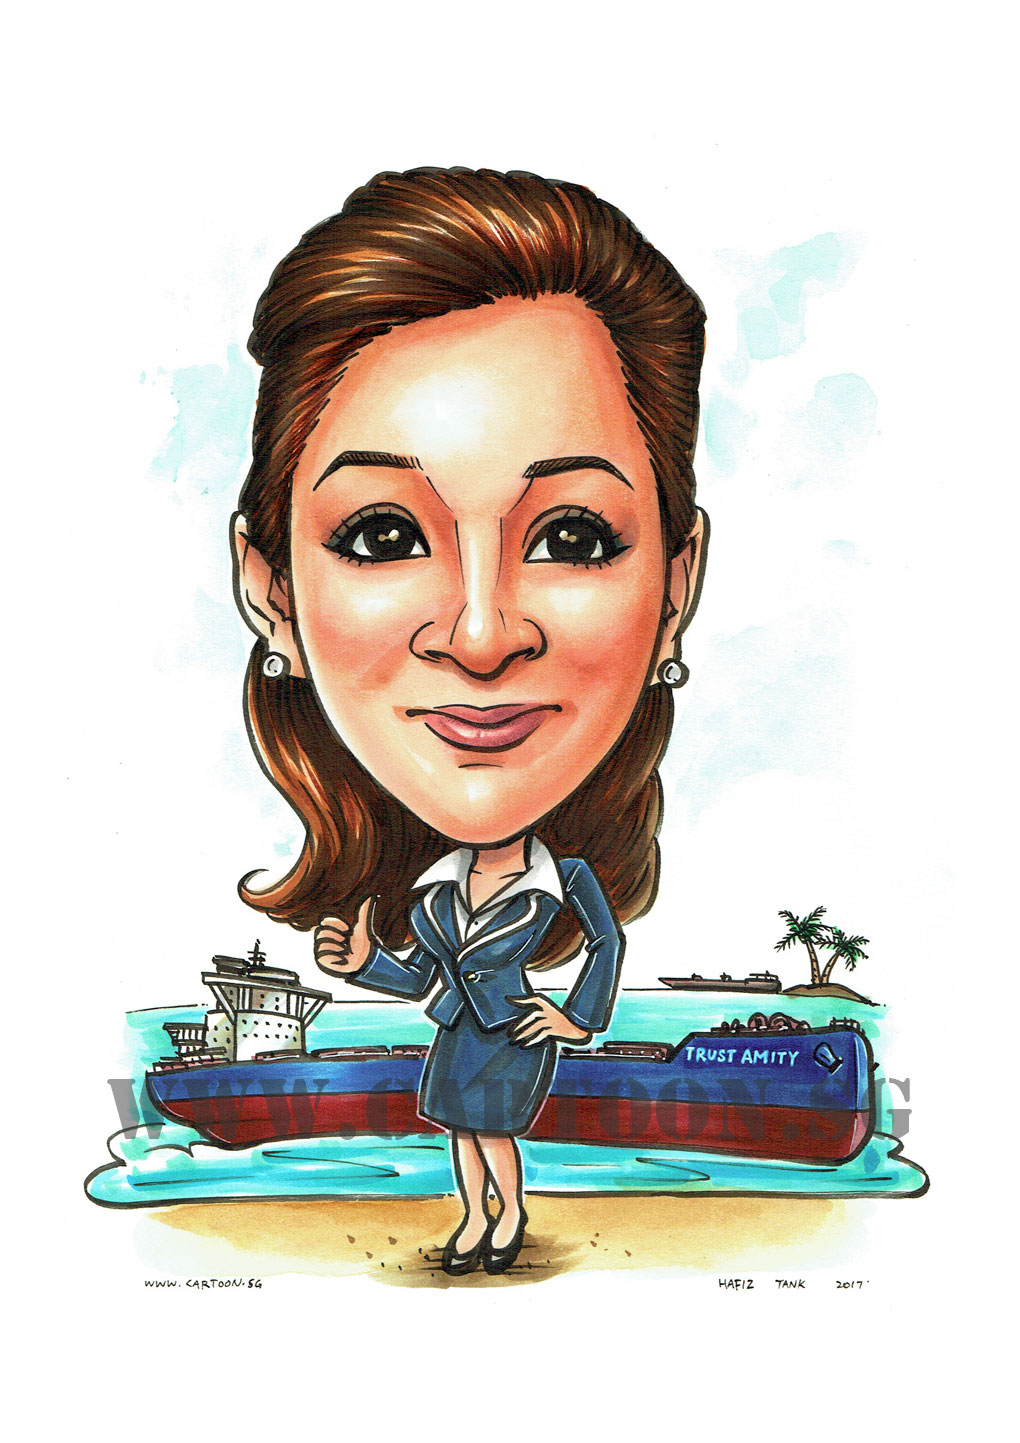 cartoon sg singapore caricature artists for gifts farewell clip art school farewell clip art free images